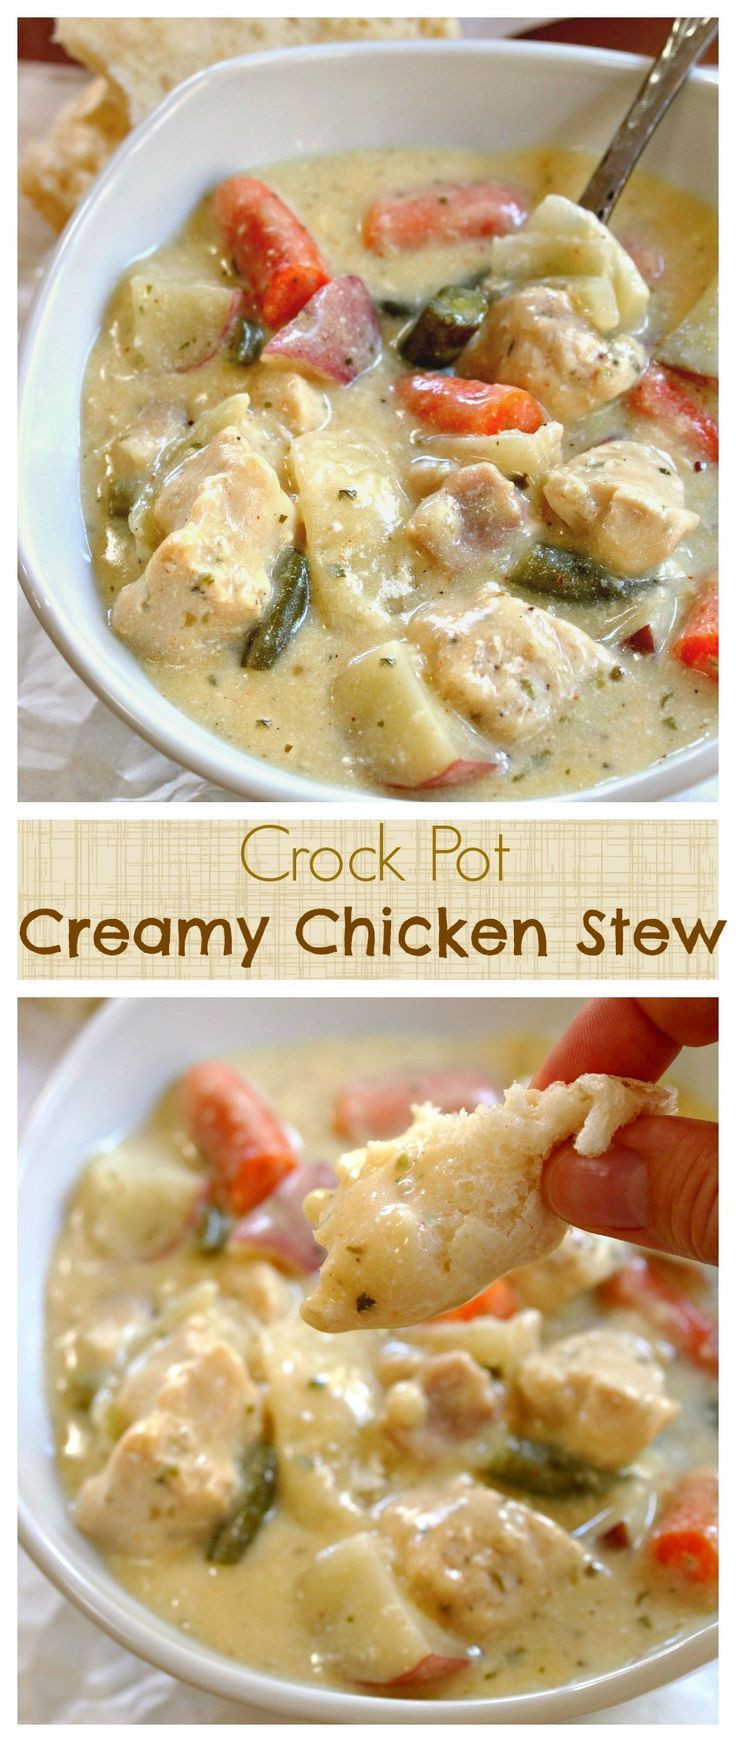 Healthy Chicken Stew Crock Pot Recipe  1000 ideas about Healthy Crock Pot Meals on Pinterest